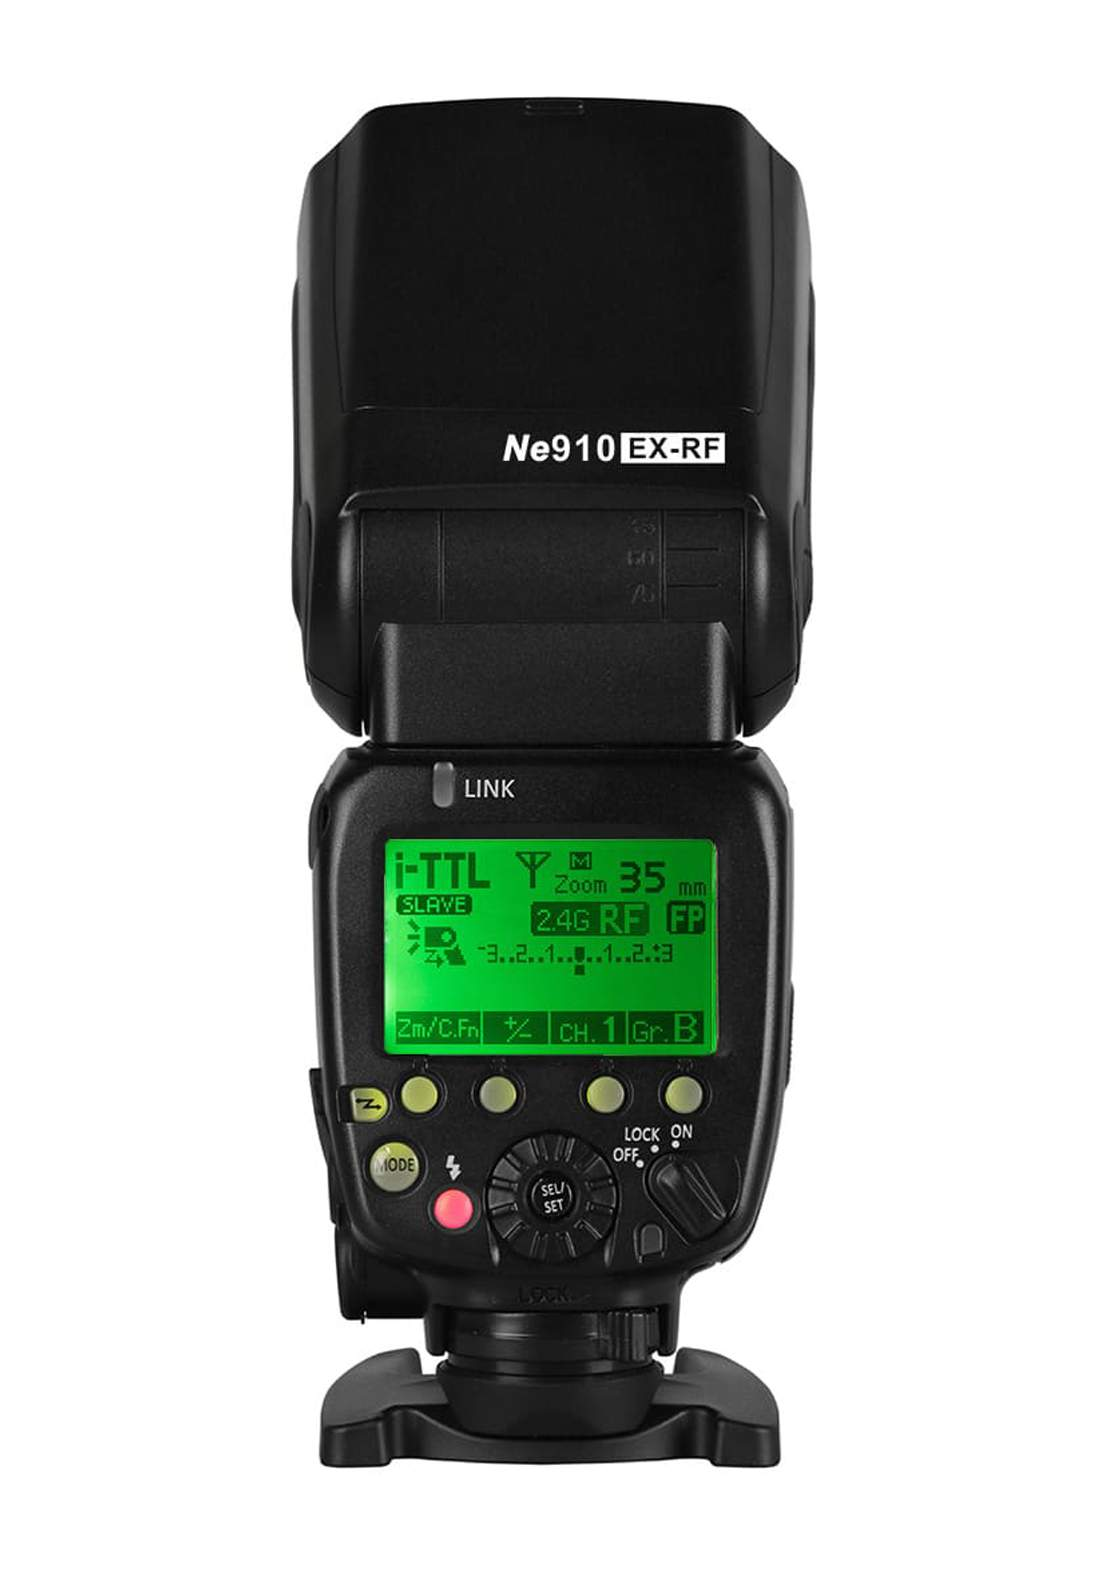 NiceFoto NE910EX-RF  Flash  For Canon & Nikon - Black فلاش كاميرا